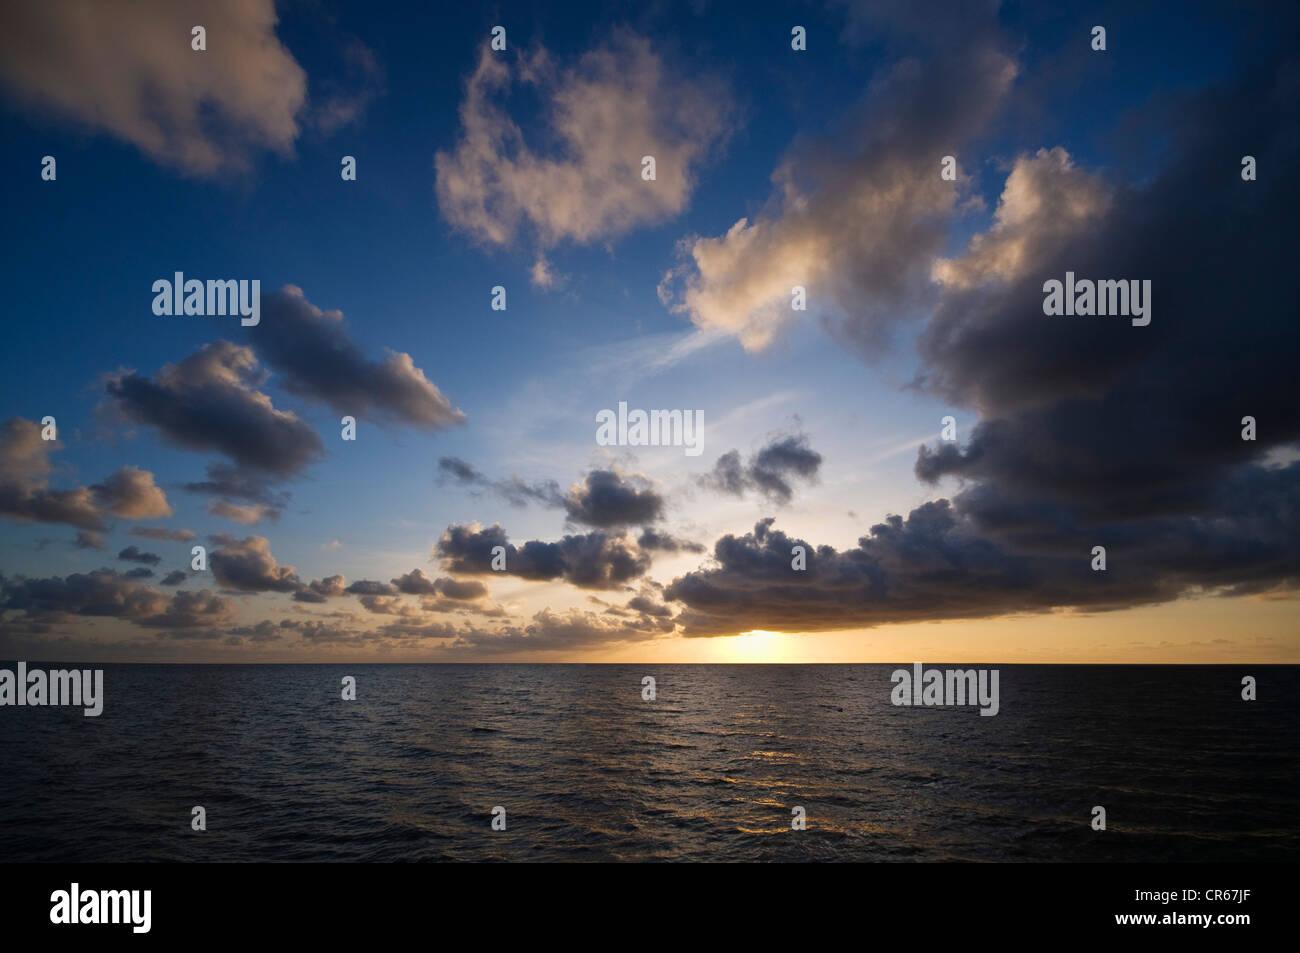 Dramatic sunset, Lower Saxon Wadden Sea, UNESCO World Heritage Site, Lower Saxony, Germany, Europe - Stock Image